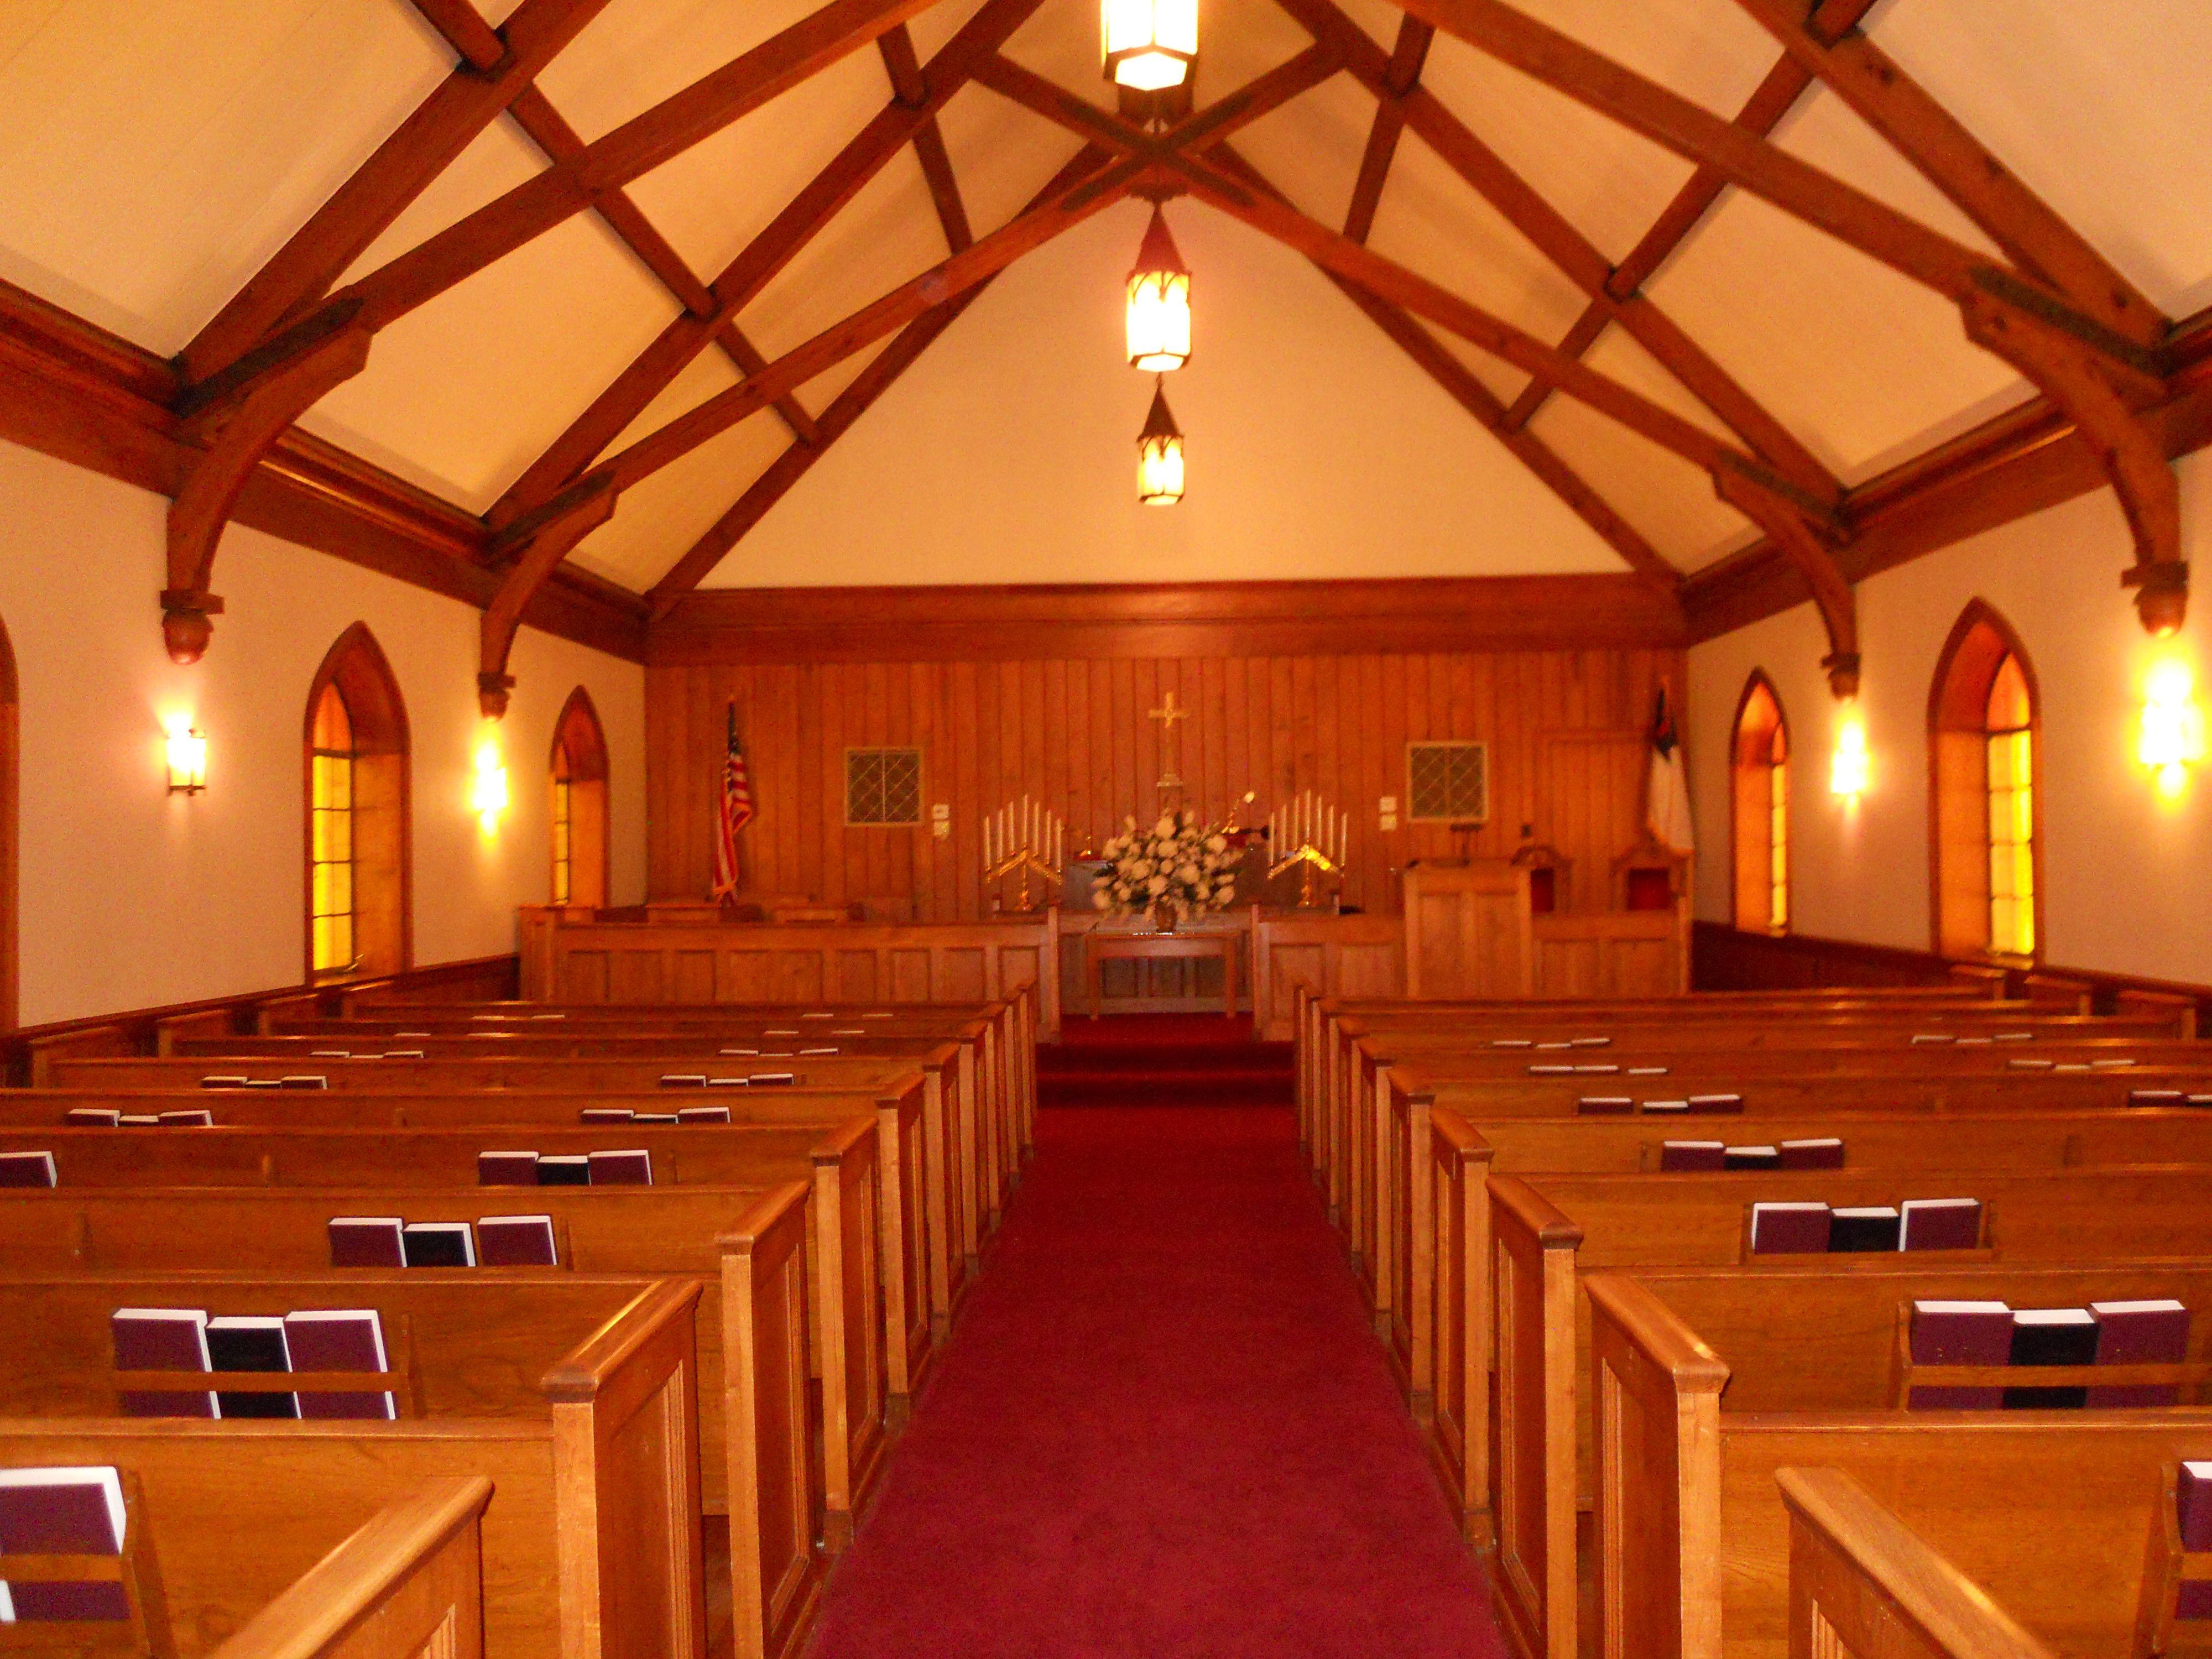 chapel inside cfp 043 jpg inside log cabin community church seat chapel inside cfp 043 jpg inside log cabin community church seat